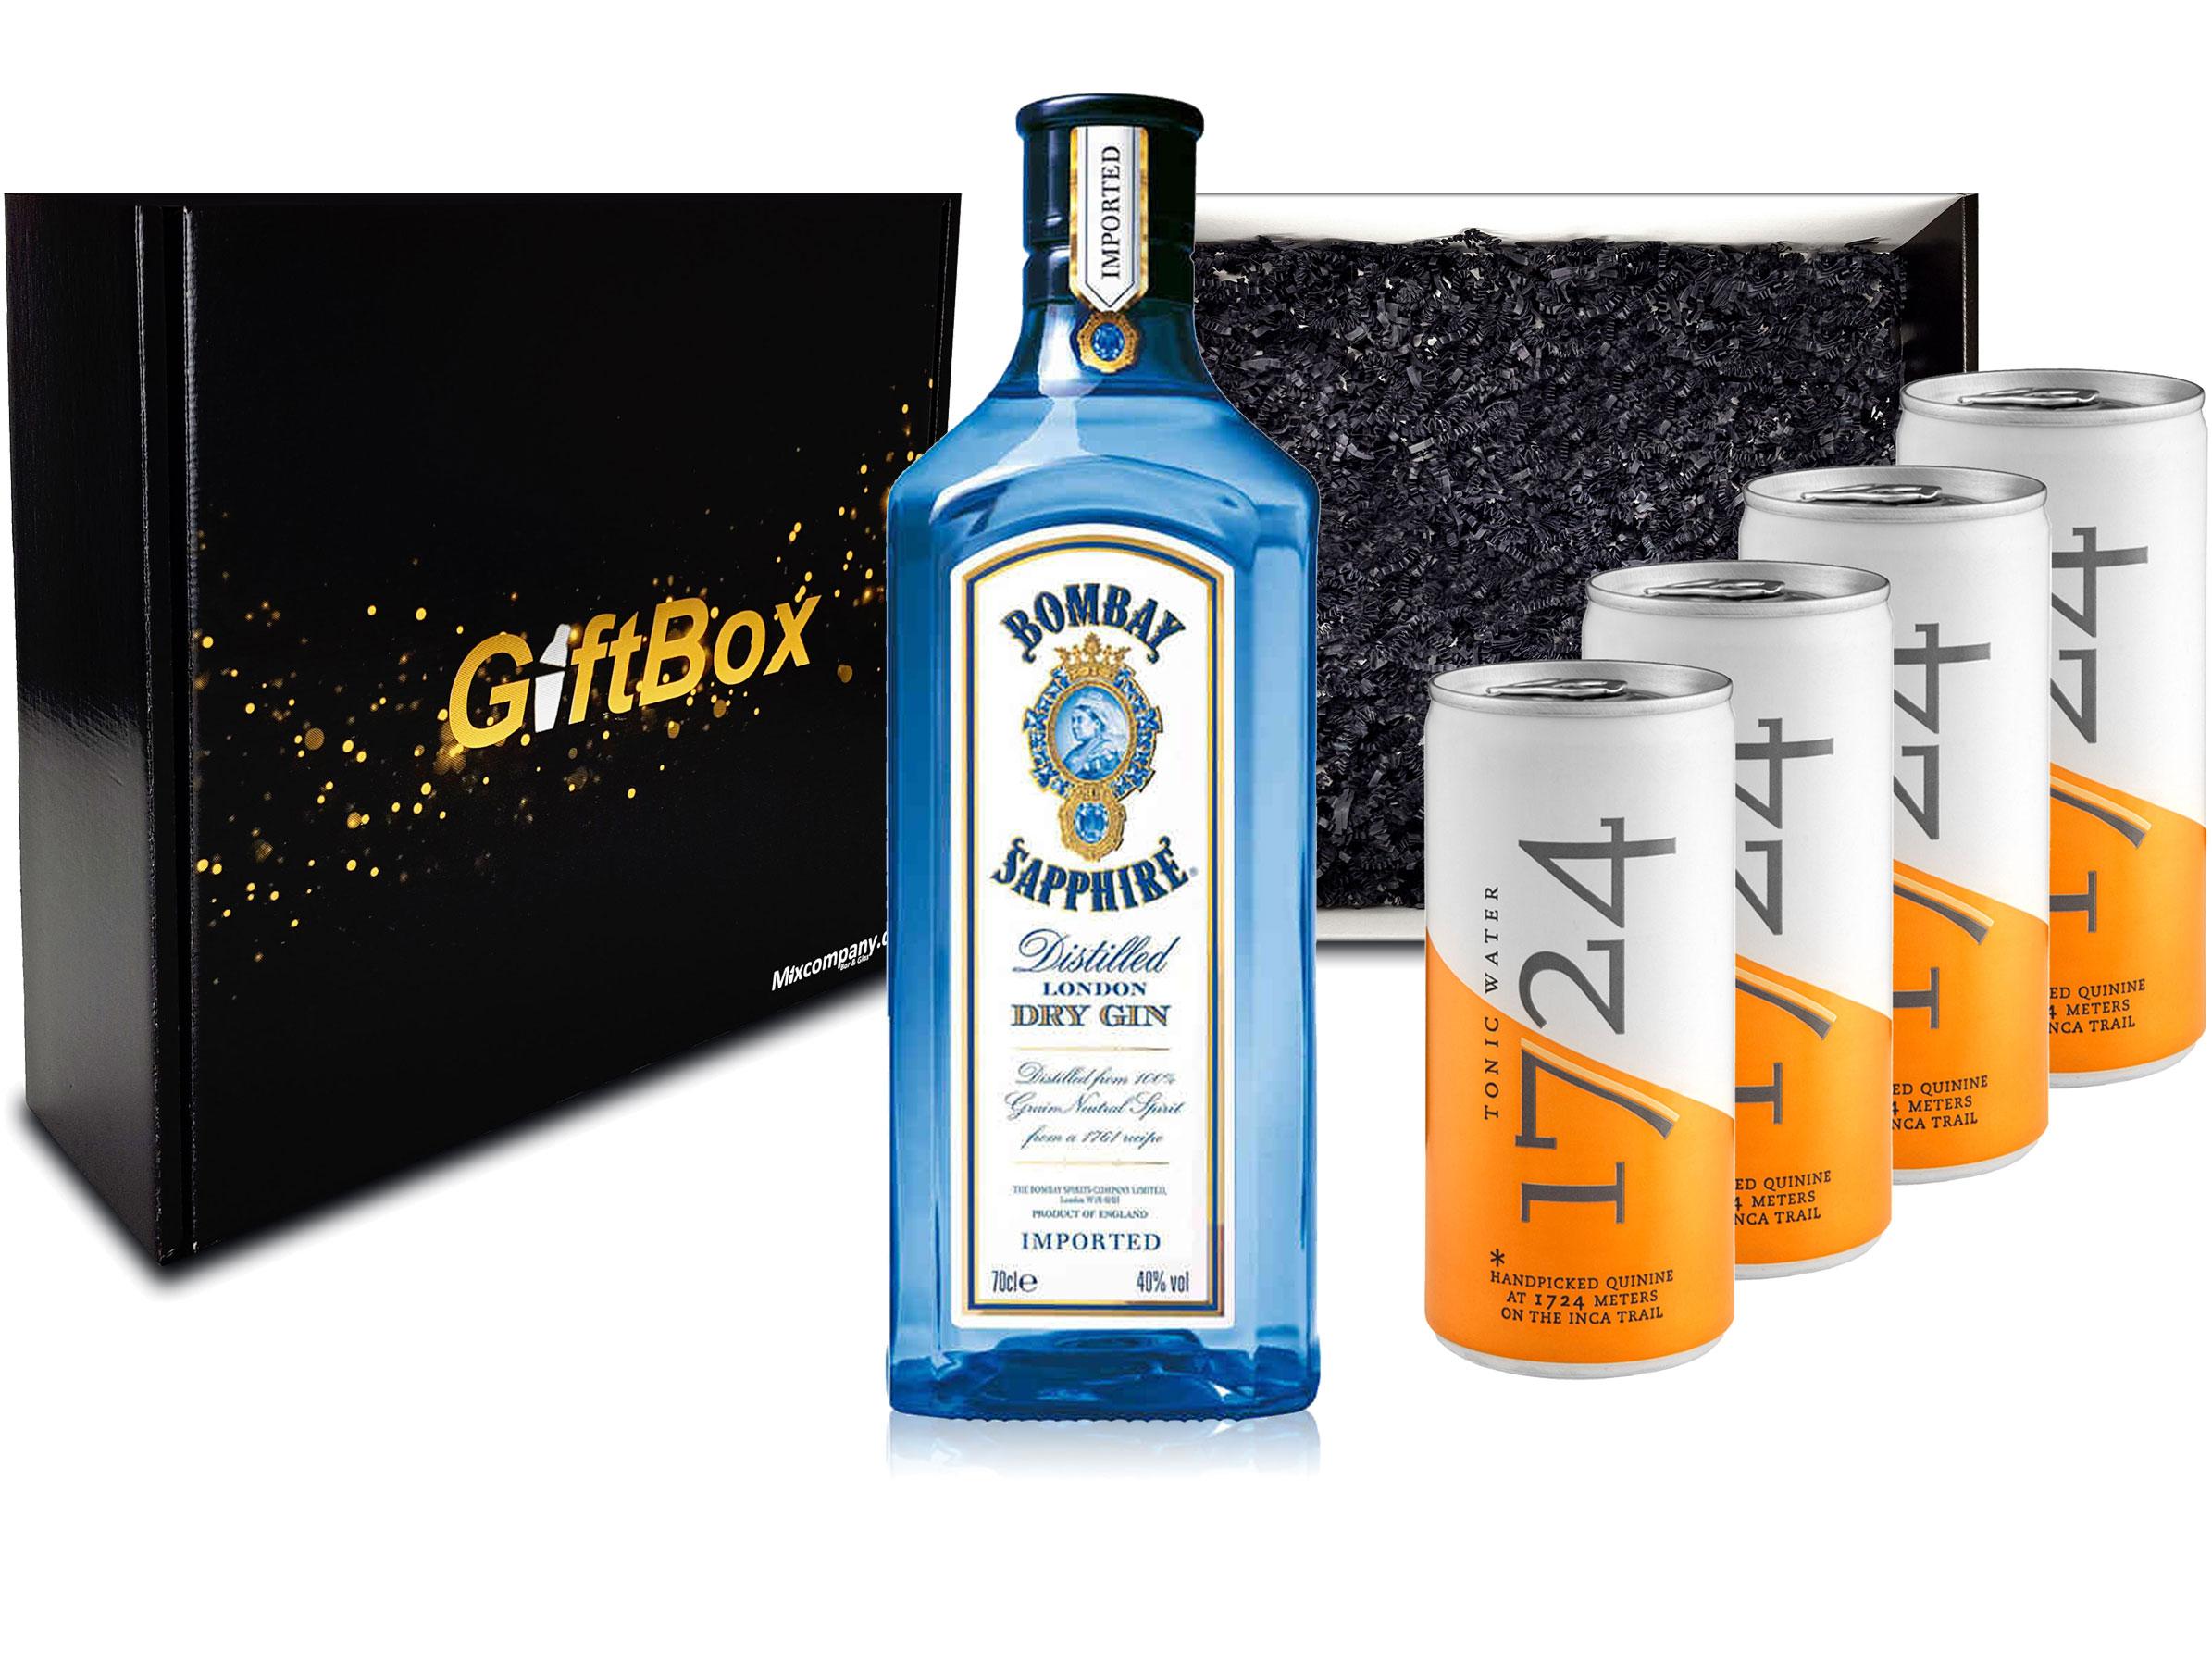 Gin Tonic Set Giftbox Geschenkset - Bombay Sapphire London Dry Gin 0,7l 700ml (40% Vol) + 4x 1724 Tonic Water Dose 200ml inkl. Pfand EINWEG -[Enthält Sulfite]